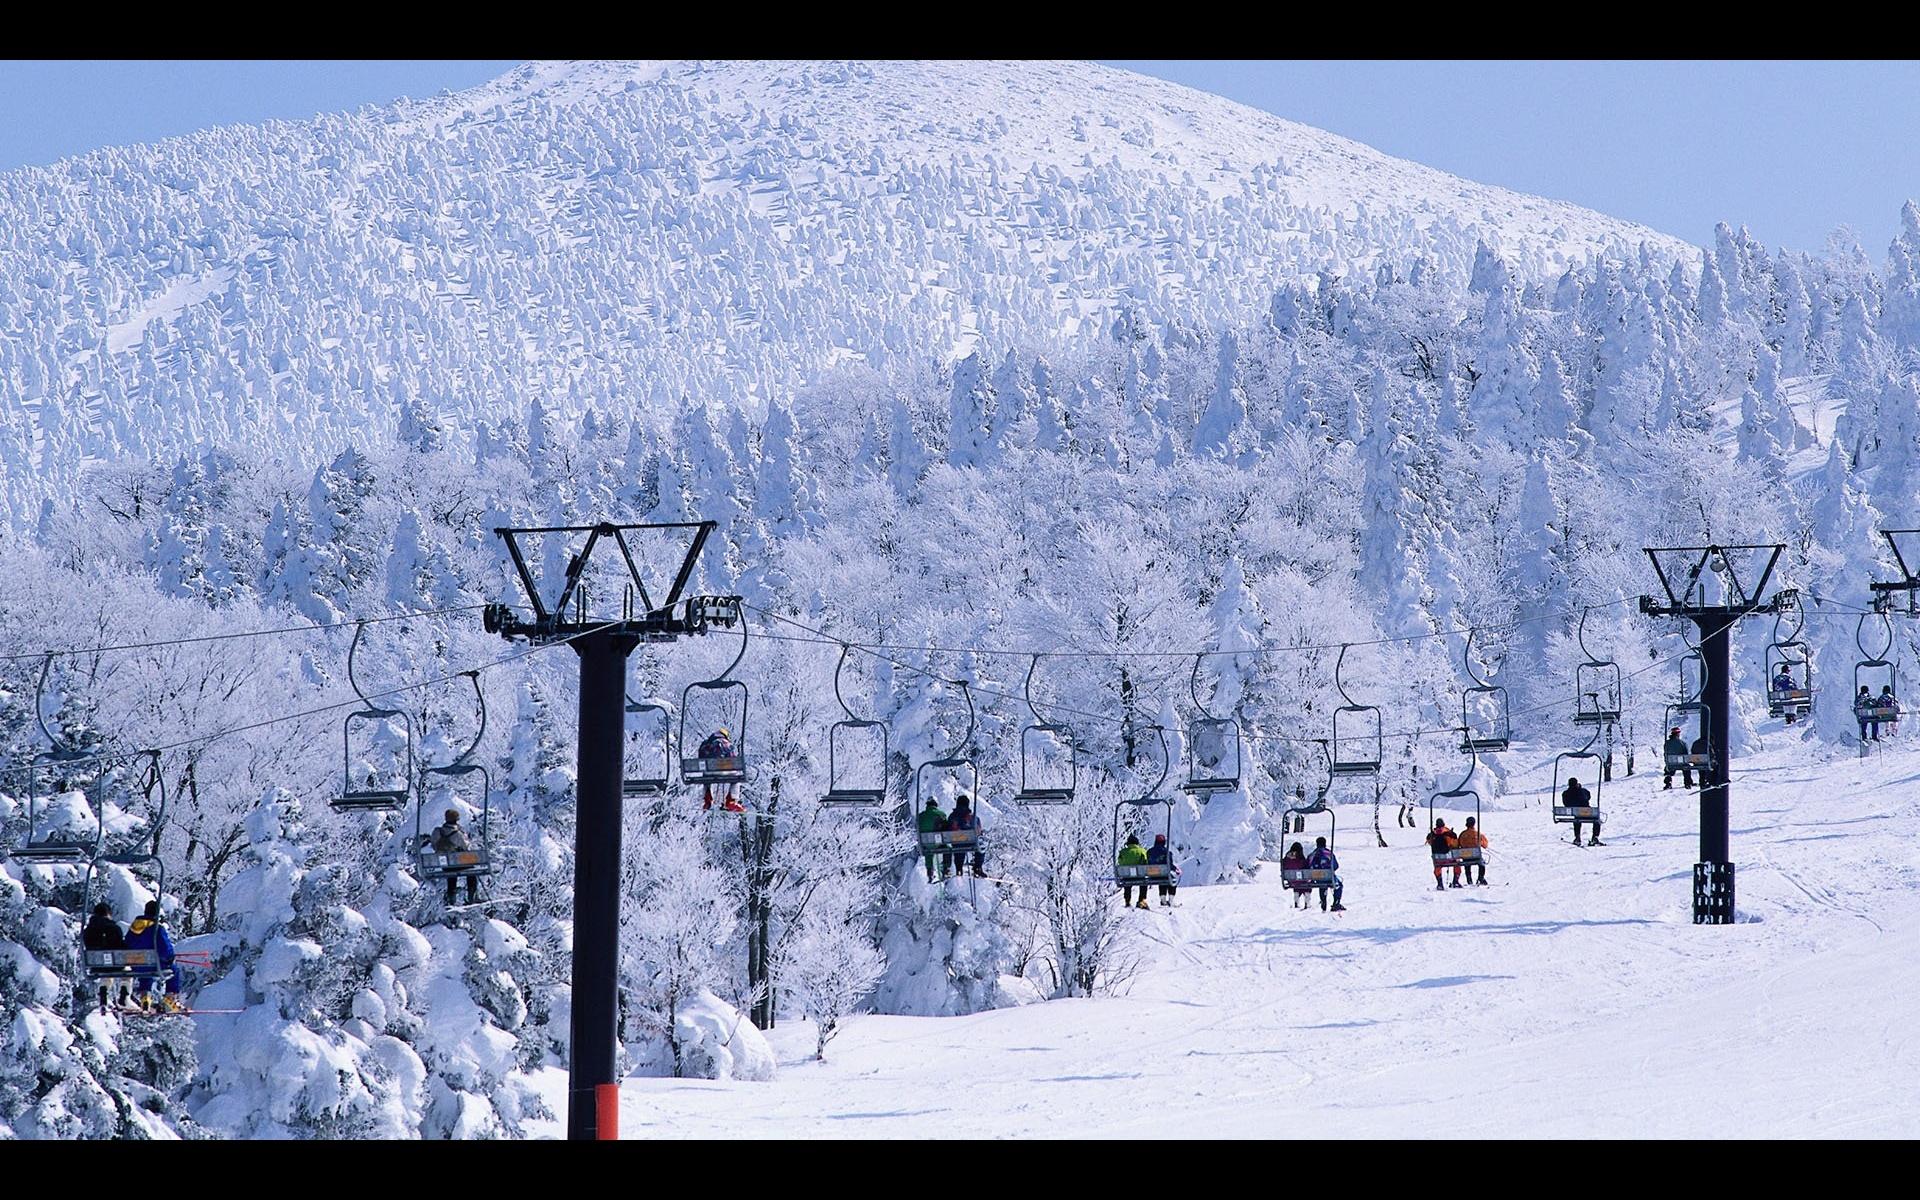 1920x1200 Ski Slope desktop wallpapers and stock photos 1920x1200